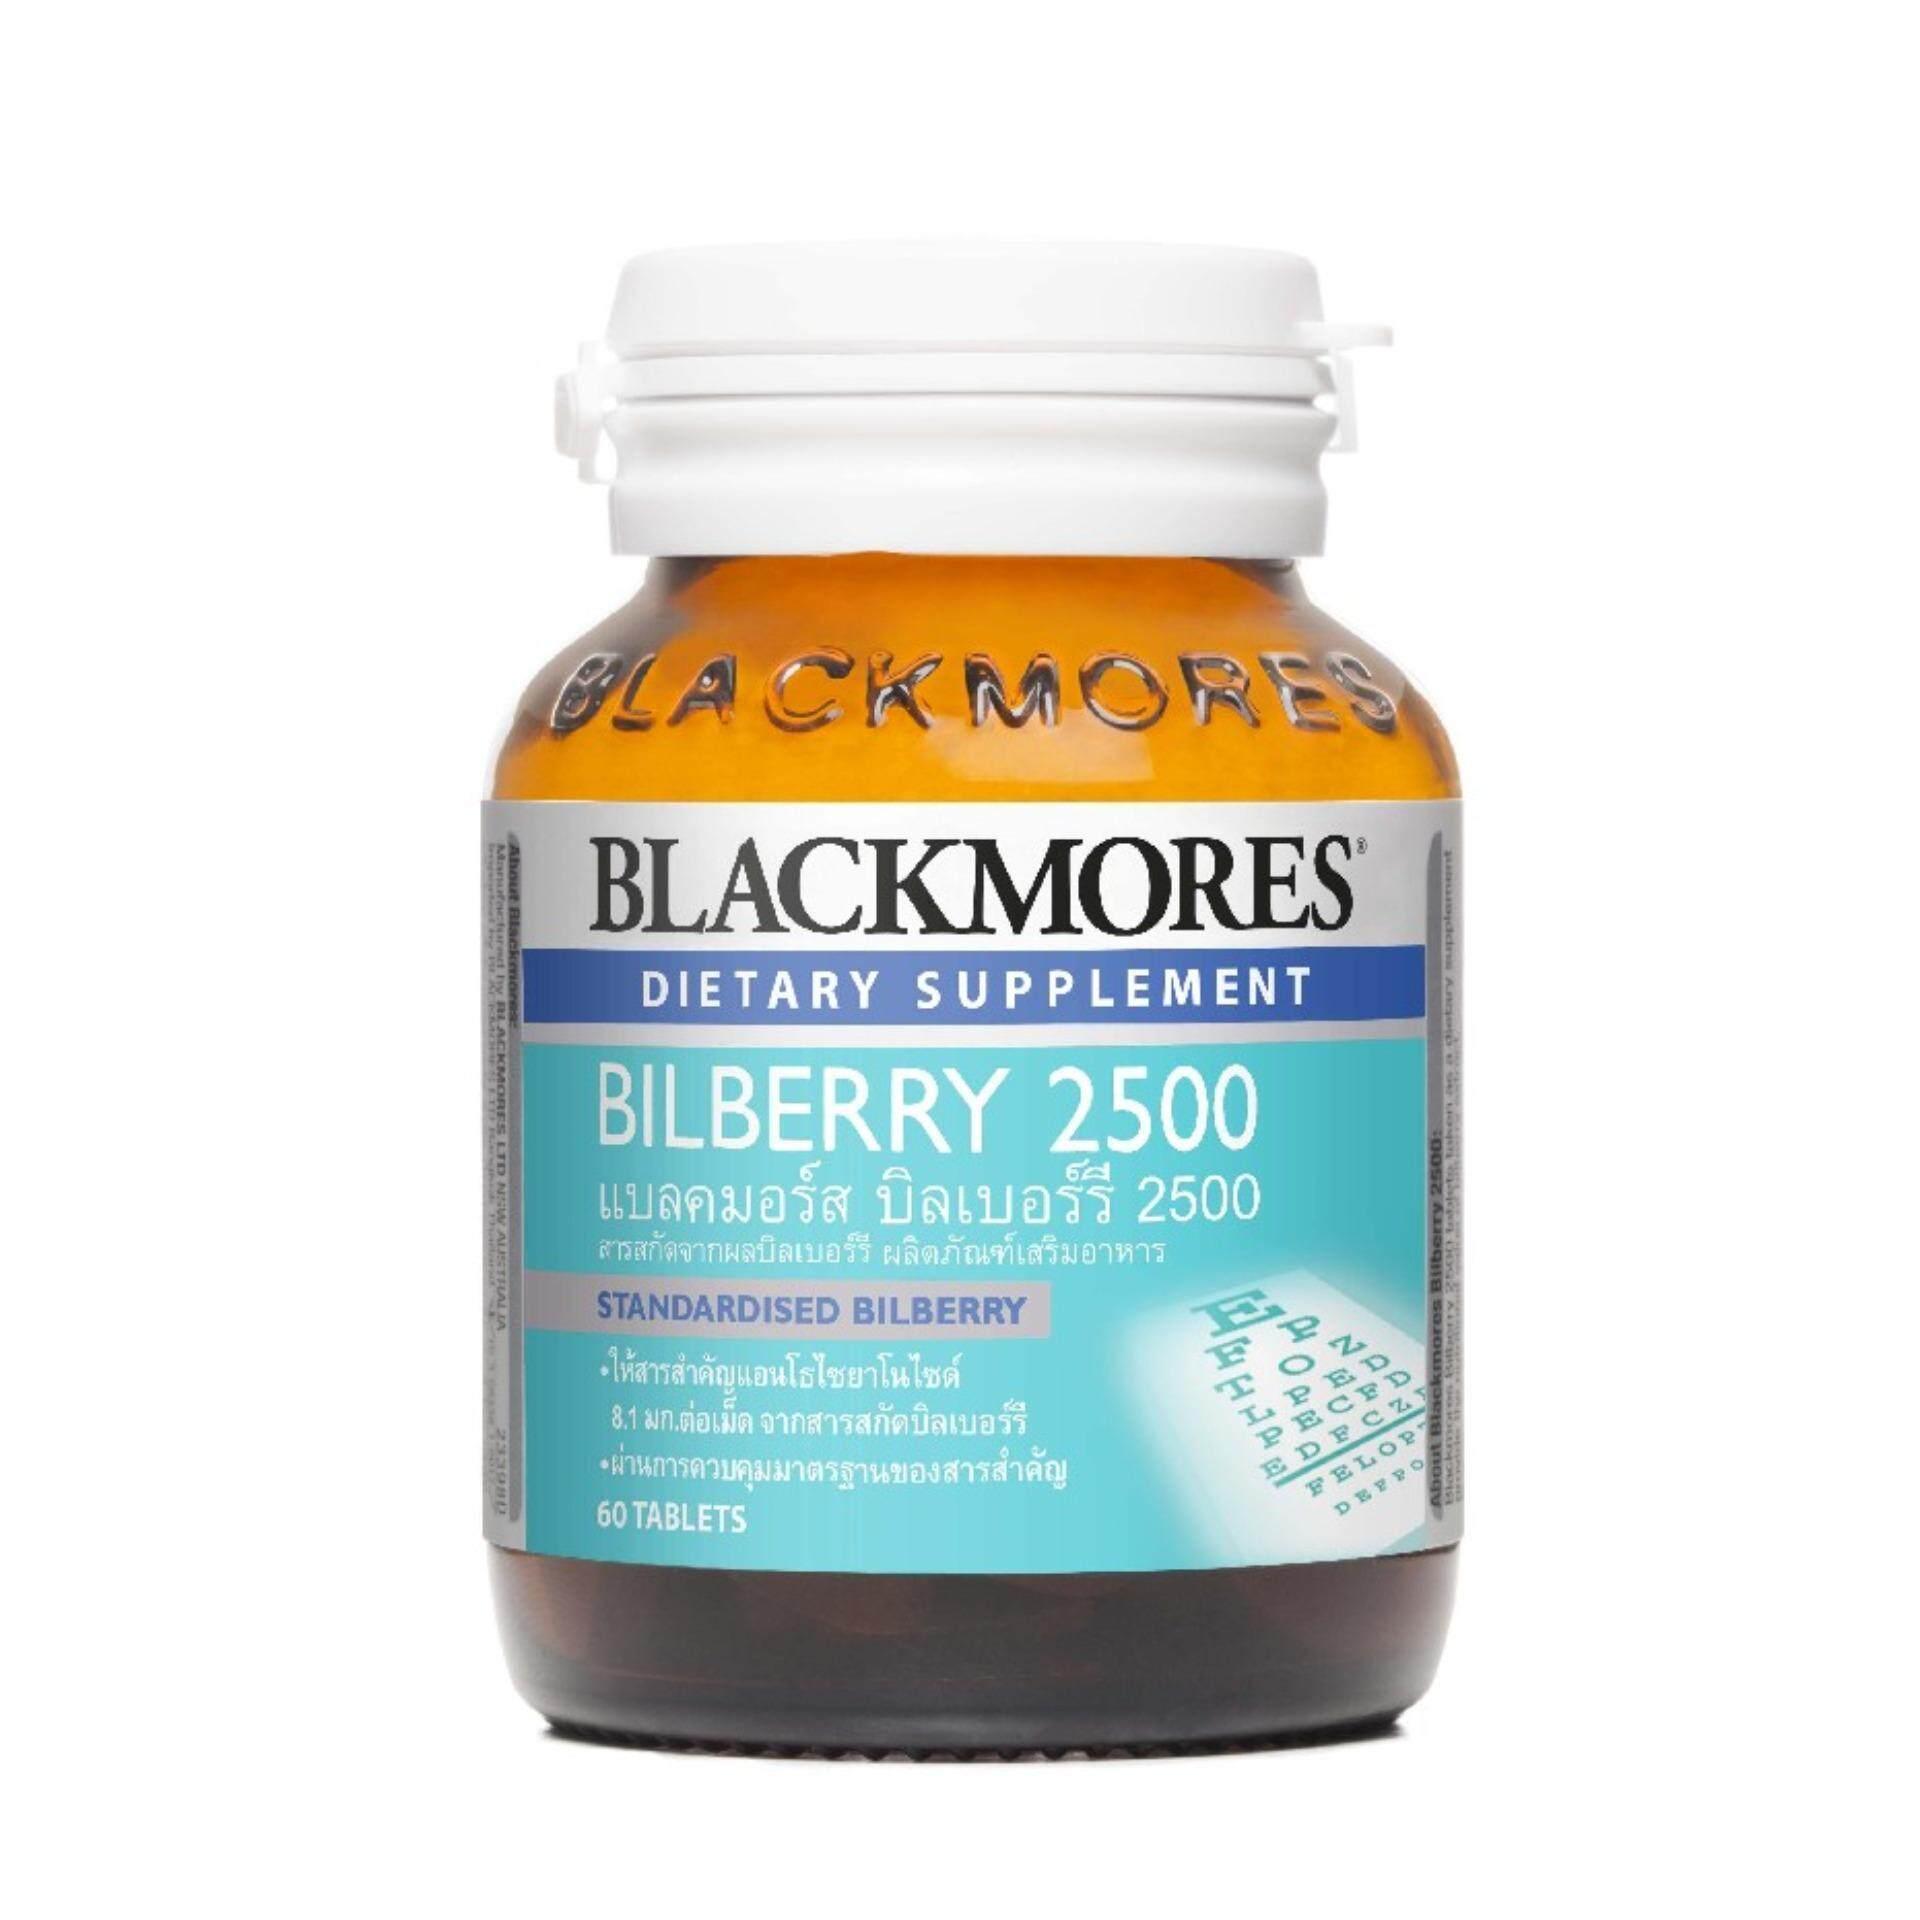 Blackmores ผลิตภัณฑ์เสริมอาหาร Bilberry 2500 (60เม็ด) By Lazada Retail Blackmores.